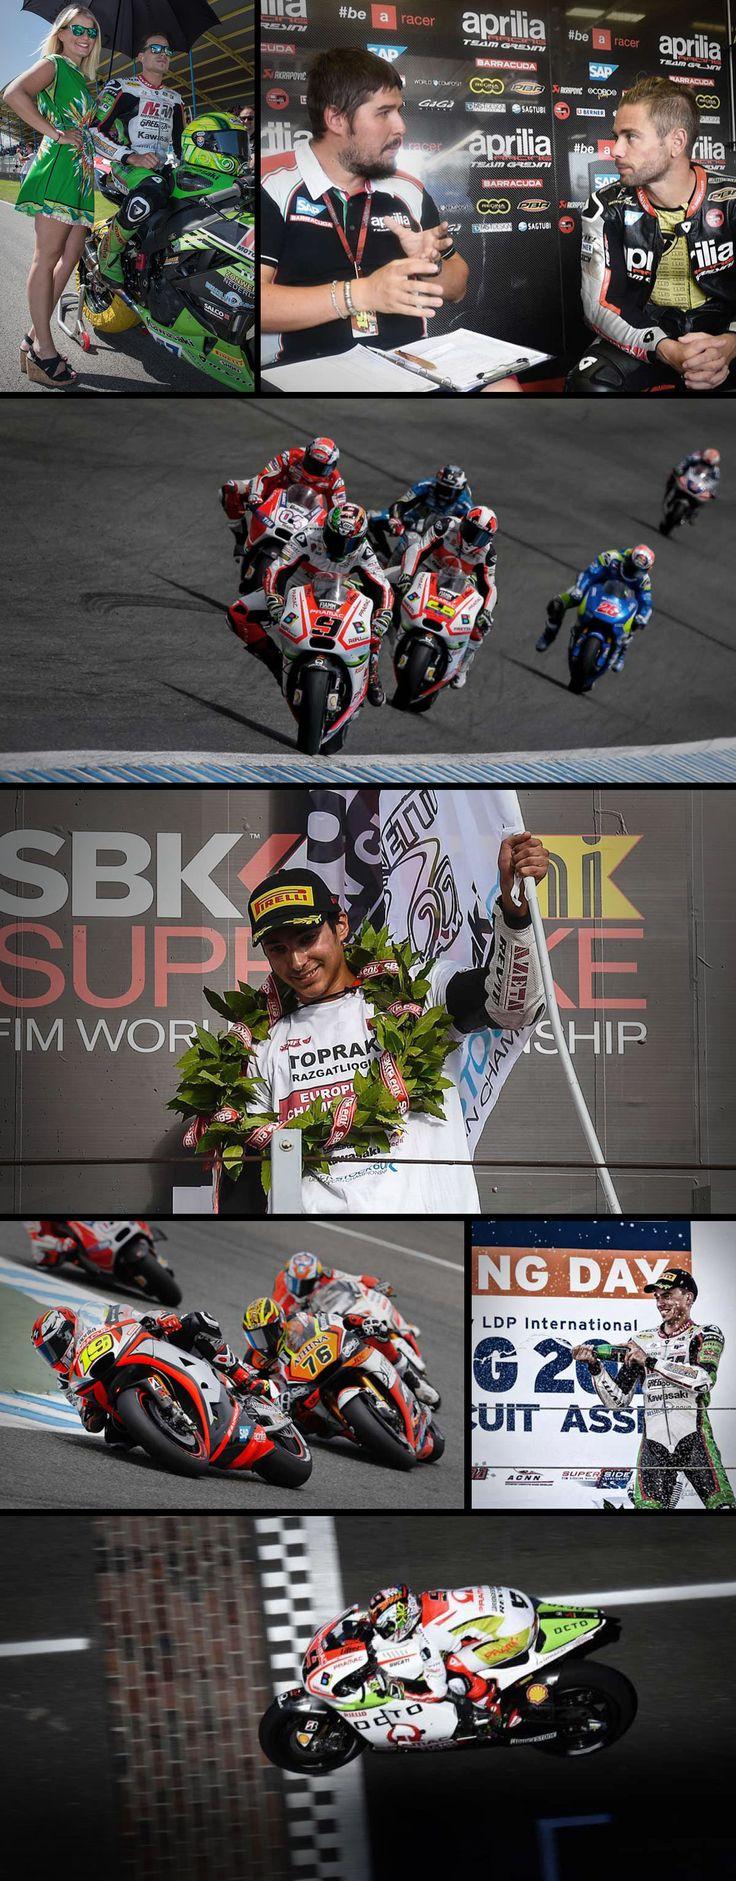 The 2015 racing season so far: epic! | REV'IT!